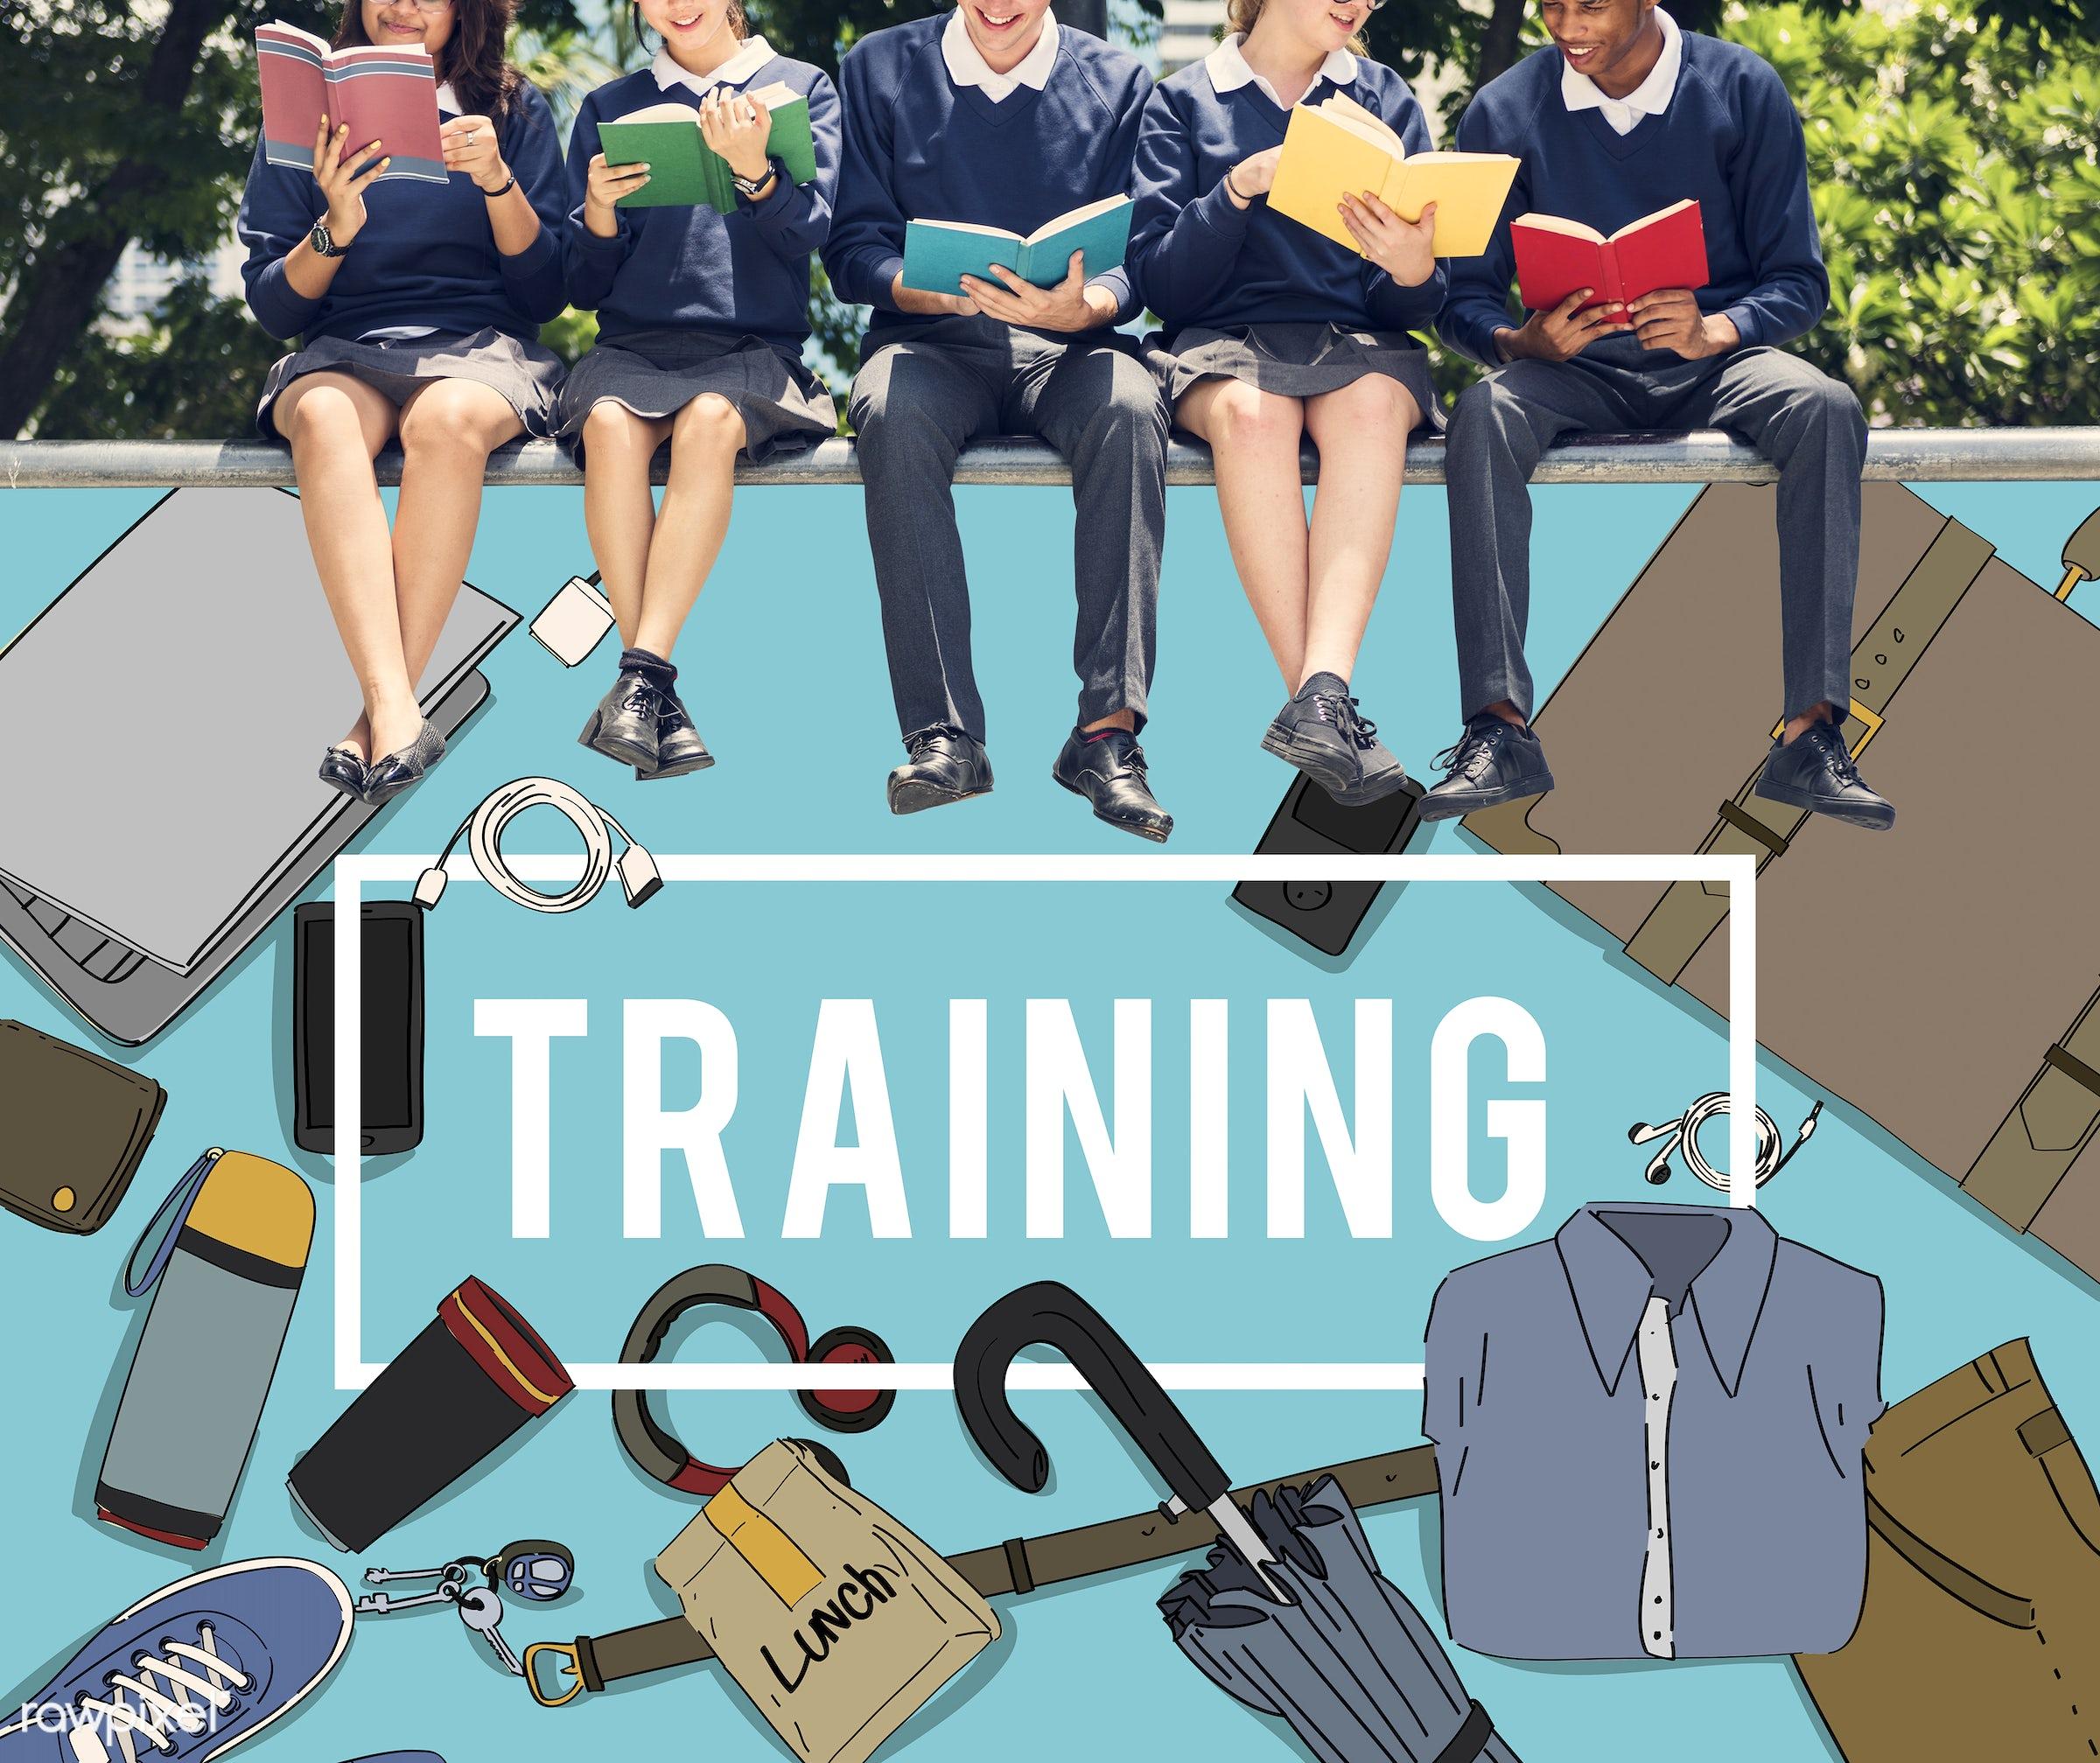 abilities, books, career, class, college, courses, development, diversity, education, employees, friends, friendship, goal,...